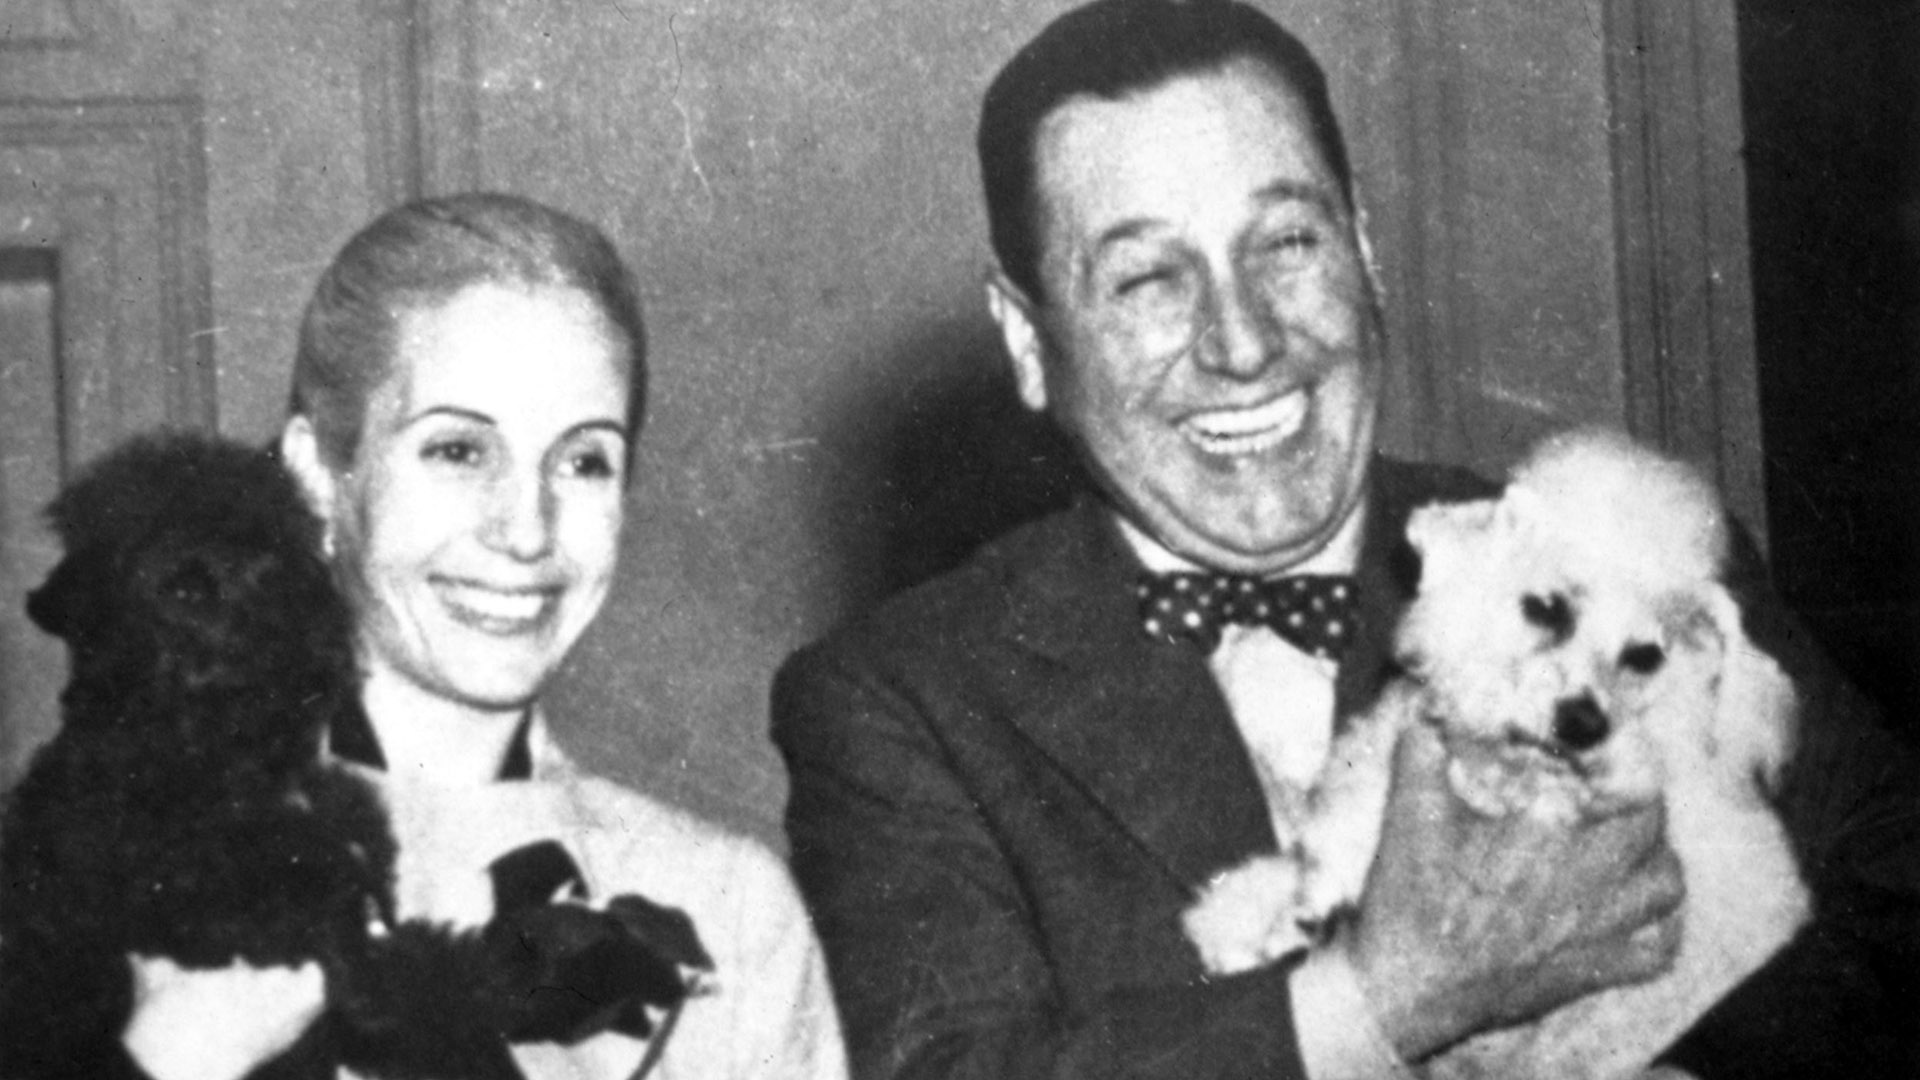 Eva y Juan Domingo Perón con sus caniches cerca de 1950 (Everett/Shutterstock)